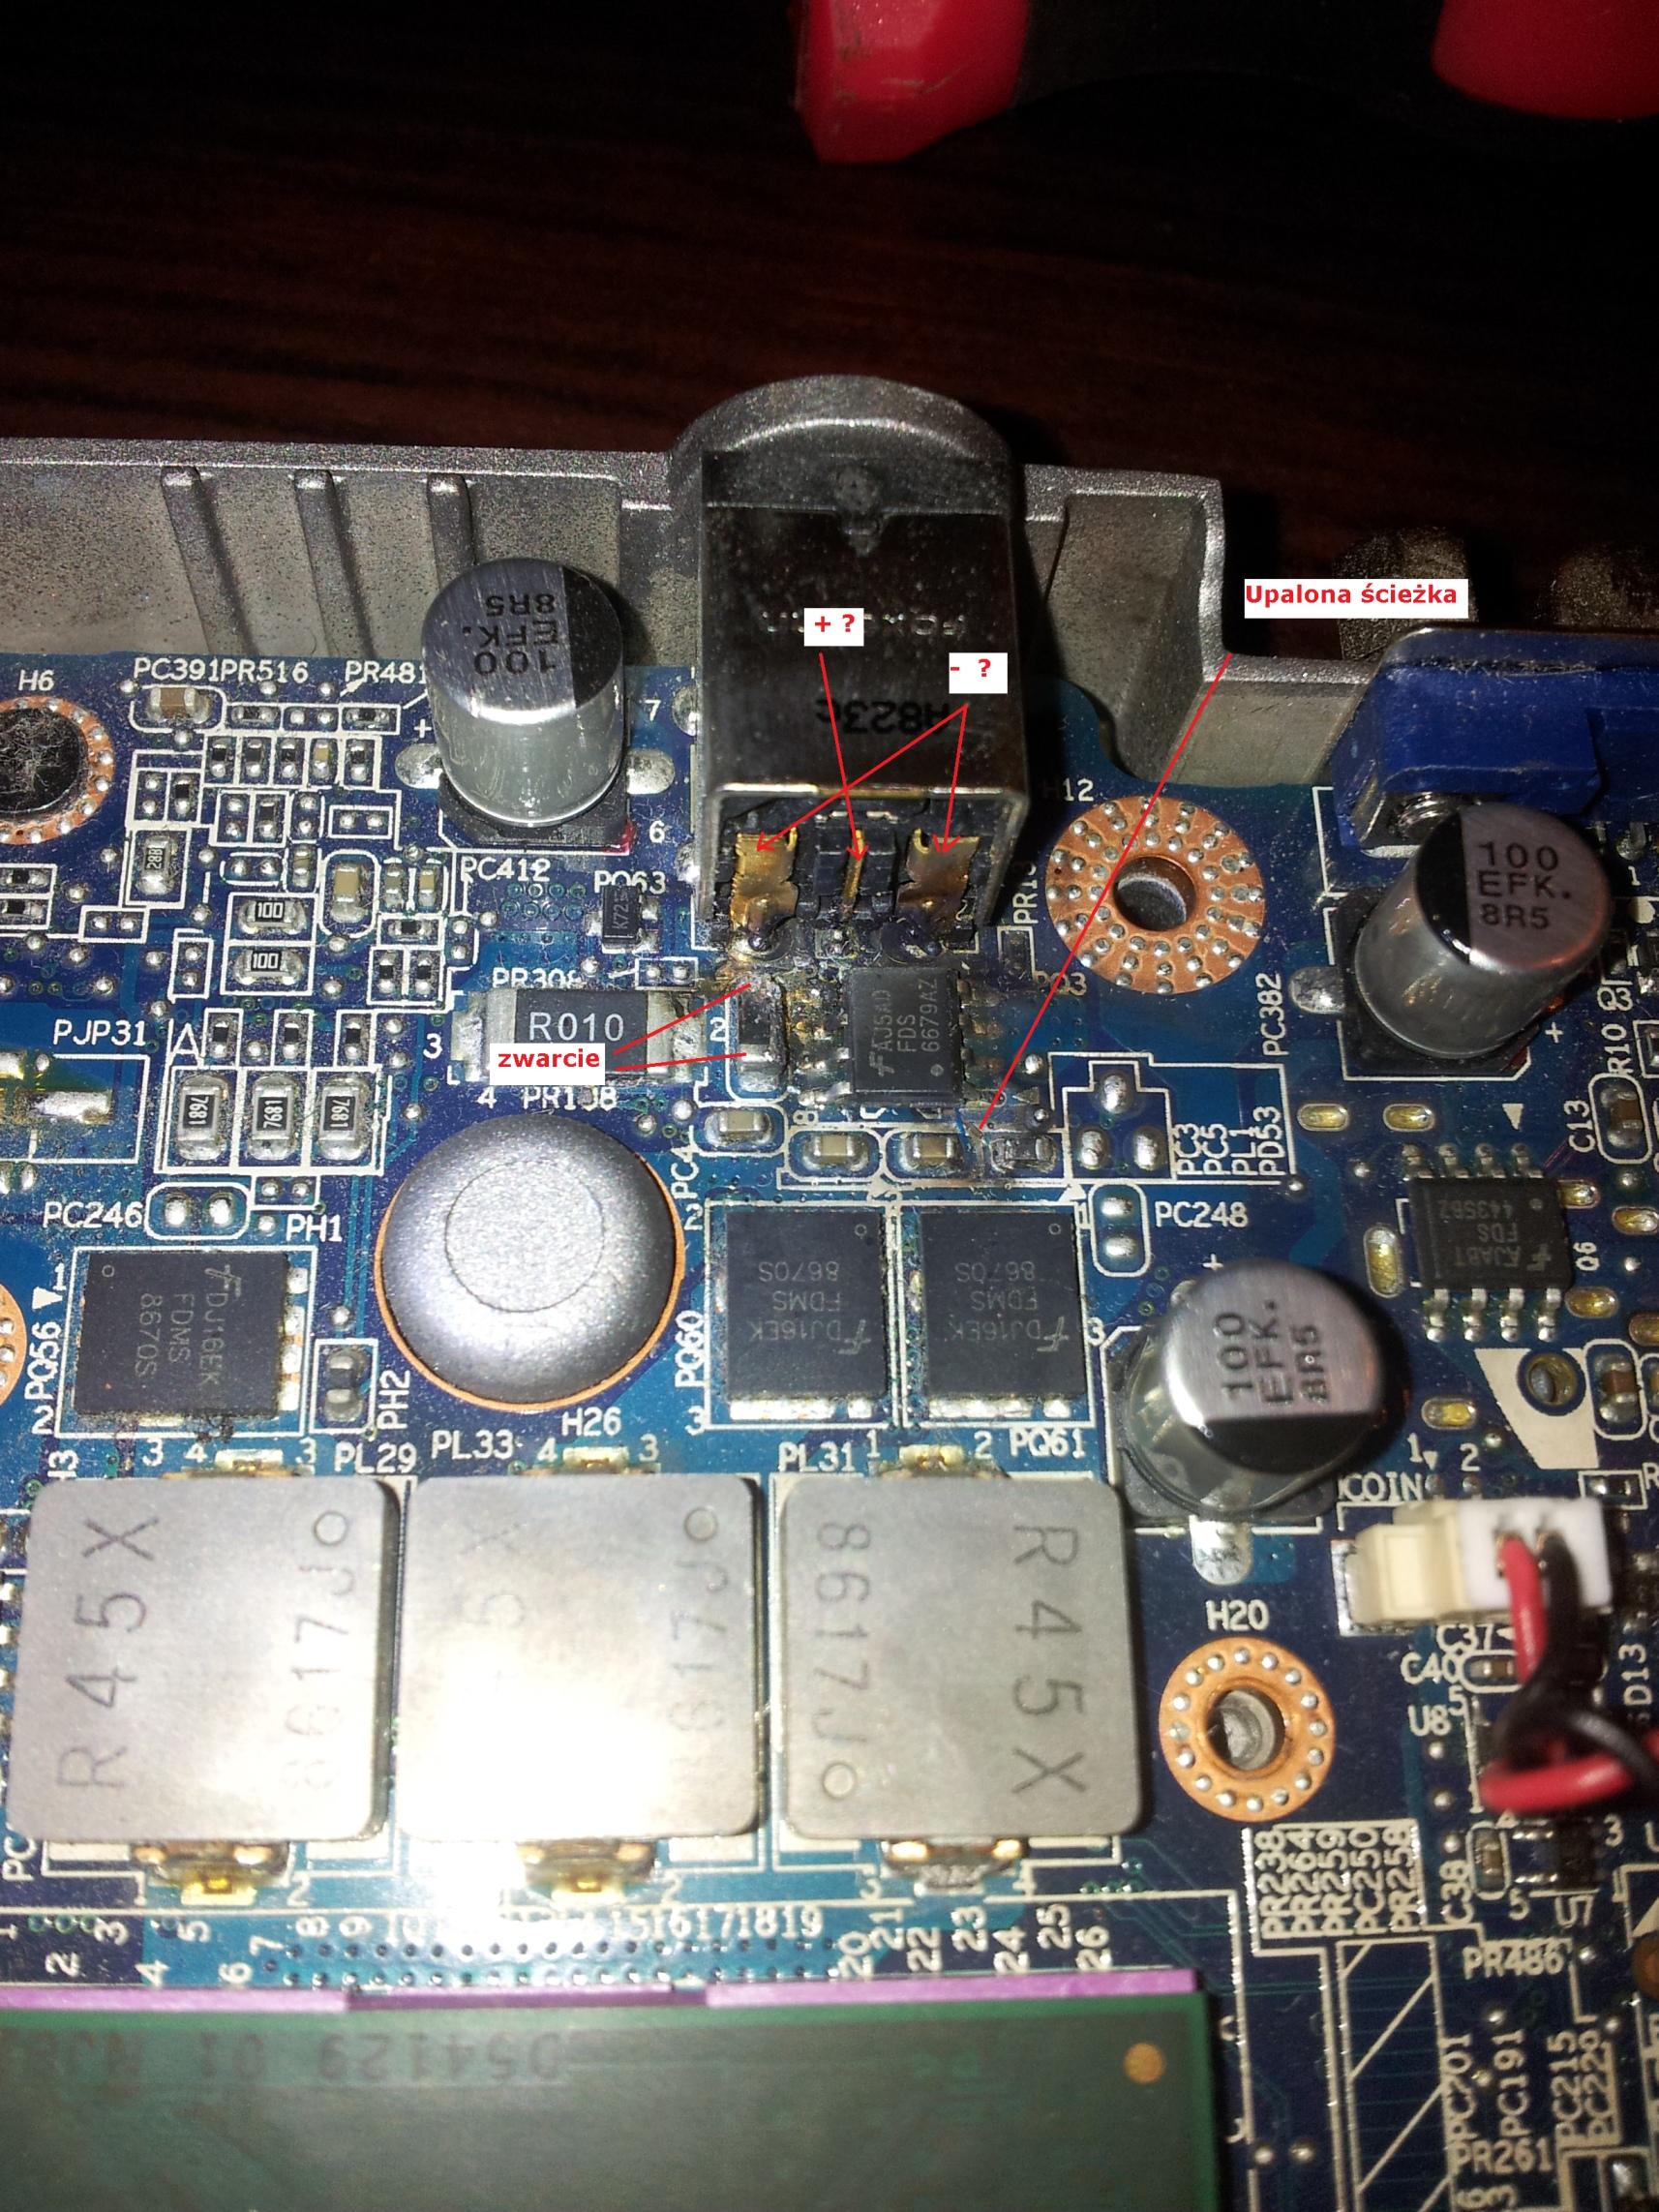 Dell Latitude D630 - Padni�ta p�yta g��wna (sekcja zasilania)